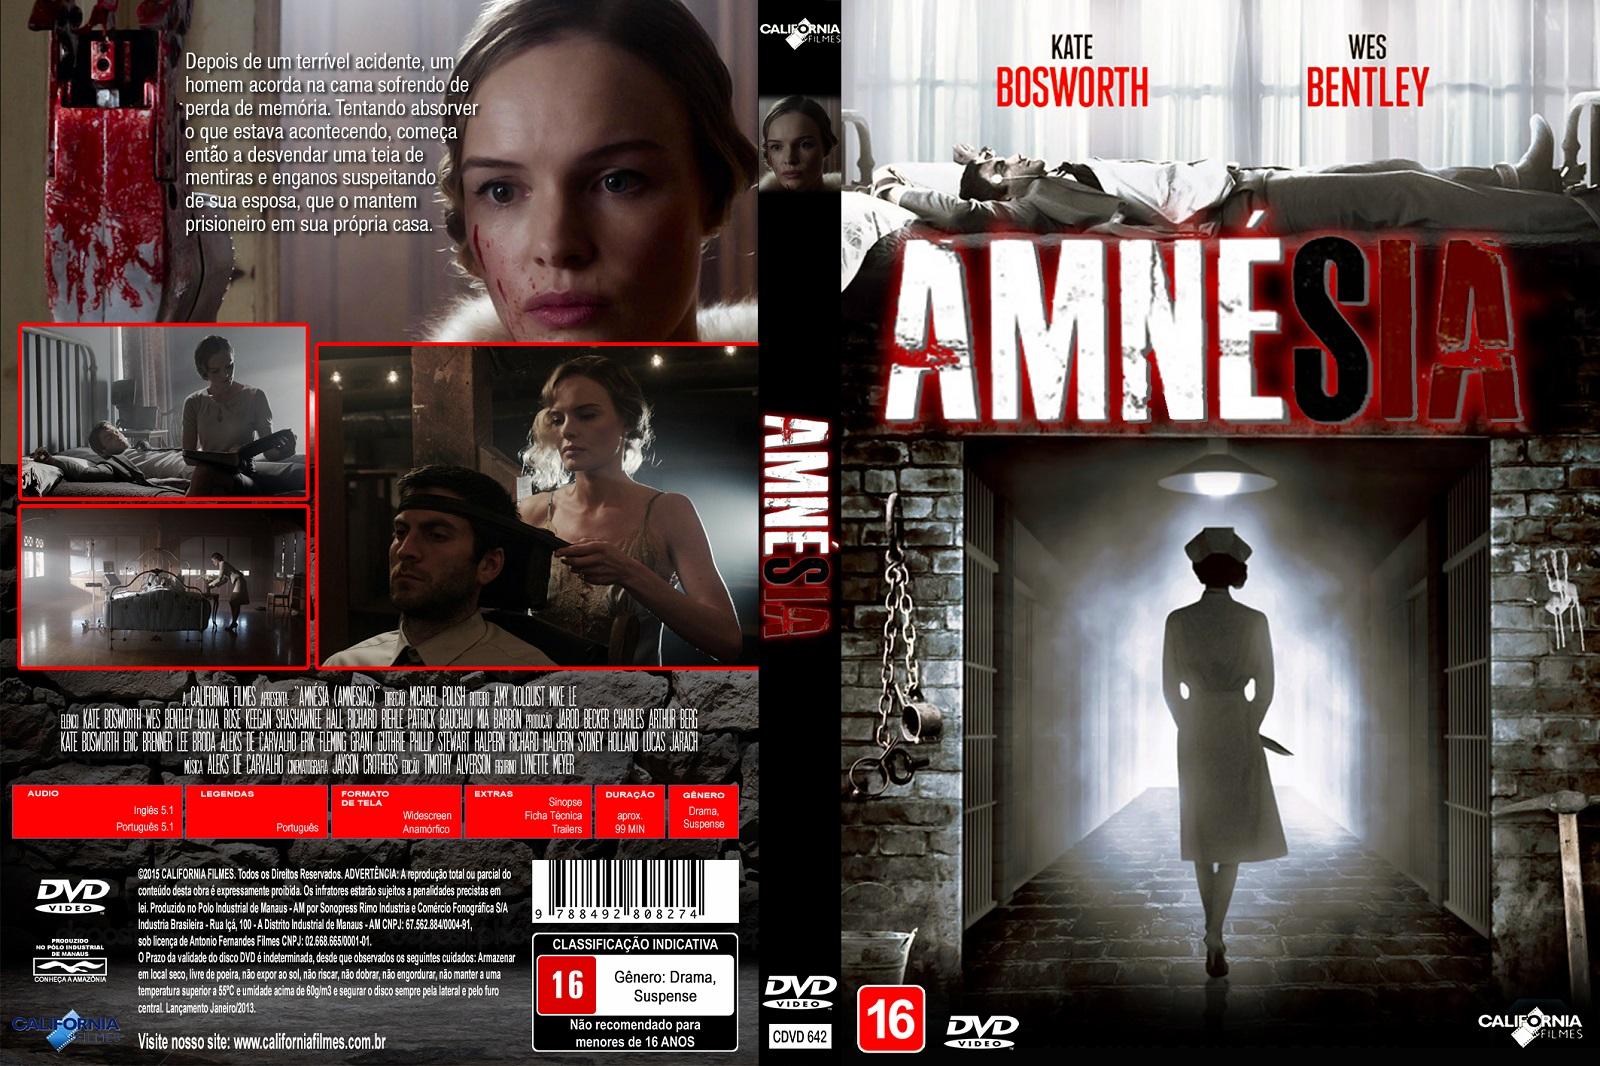 Baixar Amnésia DVDRip XviD Dual Áudio Amn 25C3 25A9sia